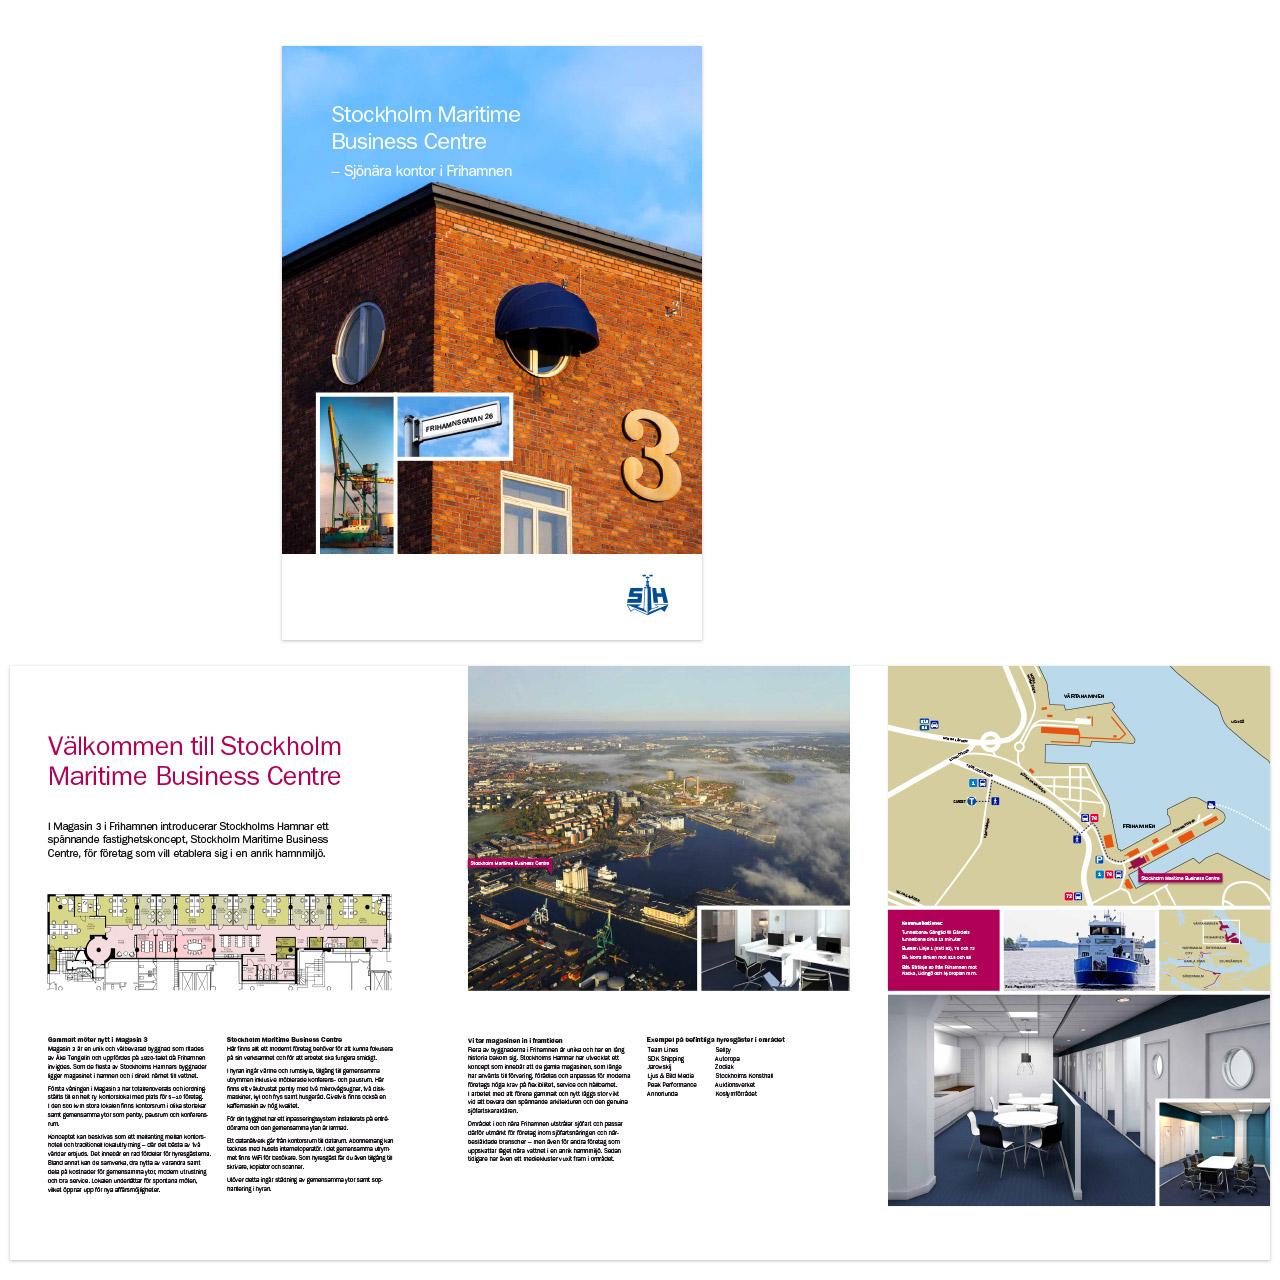 Stockholm Maritime Business Centre